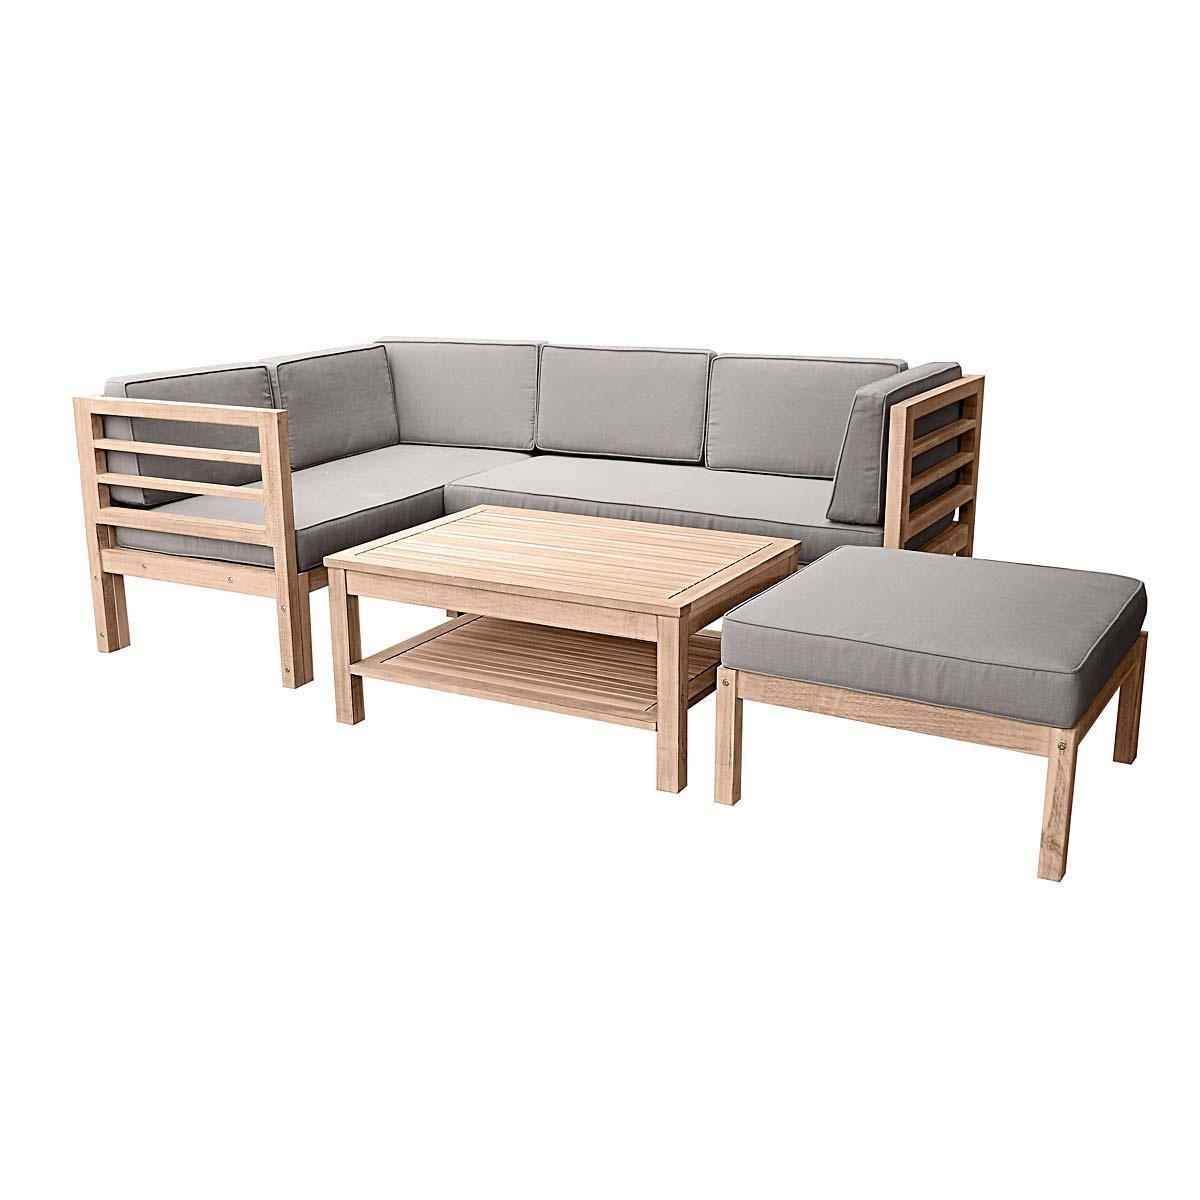 Gartenmöbel Set Variabel, 3 tlg., inkl. Auflagen, Holz Jetzt